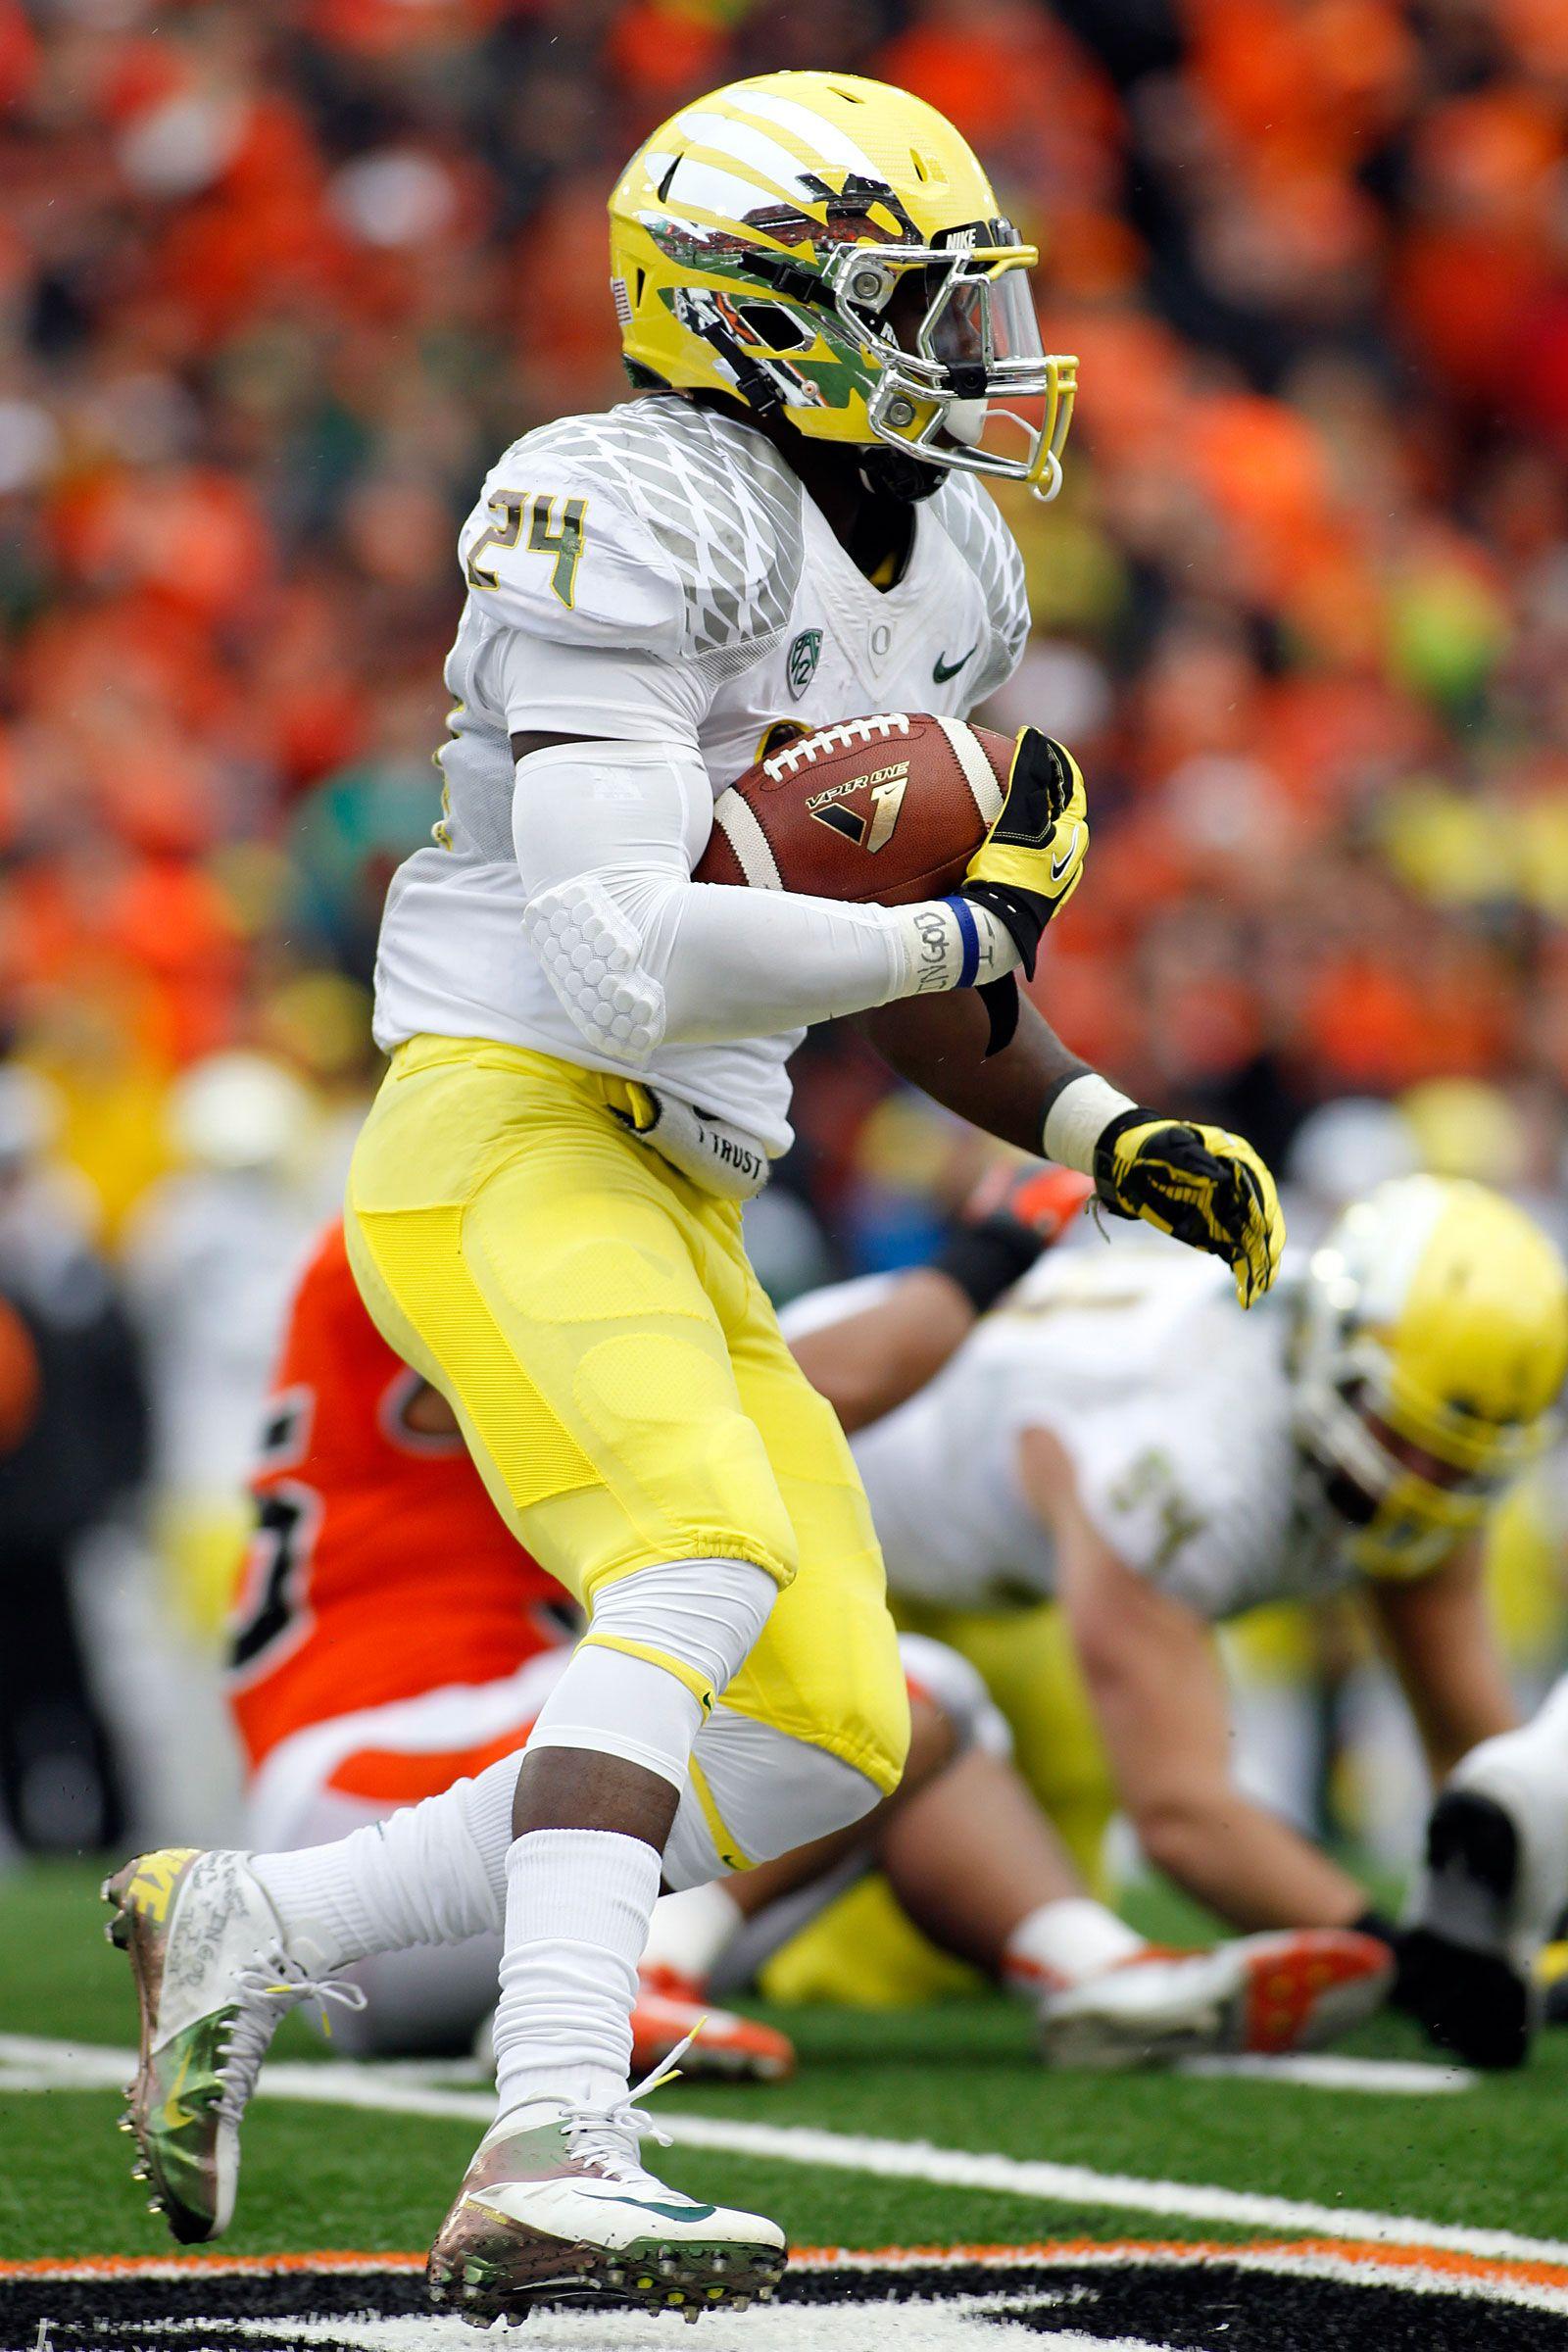 fbf785b0a Nov. 24 at Oregon State  Yellow helmet